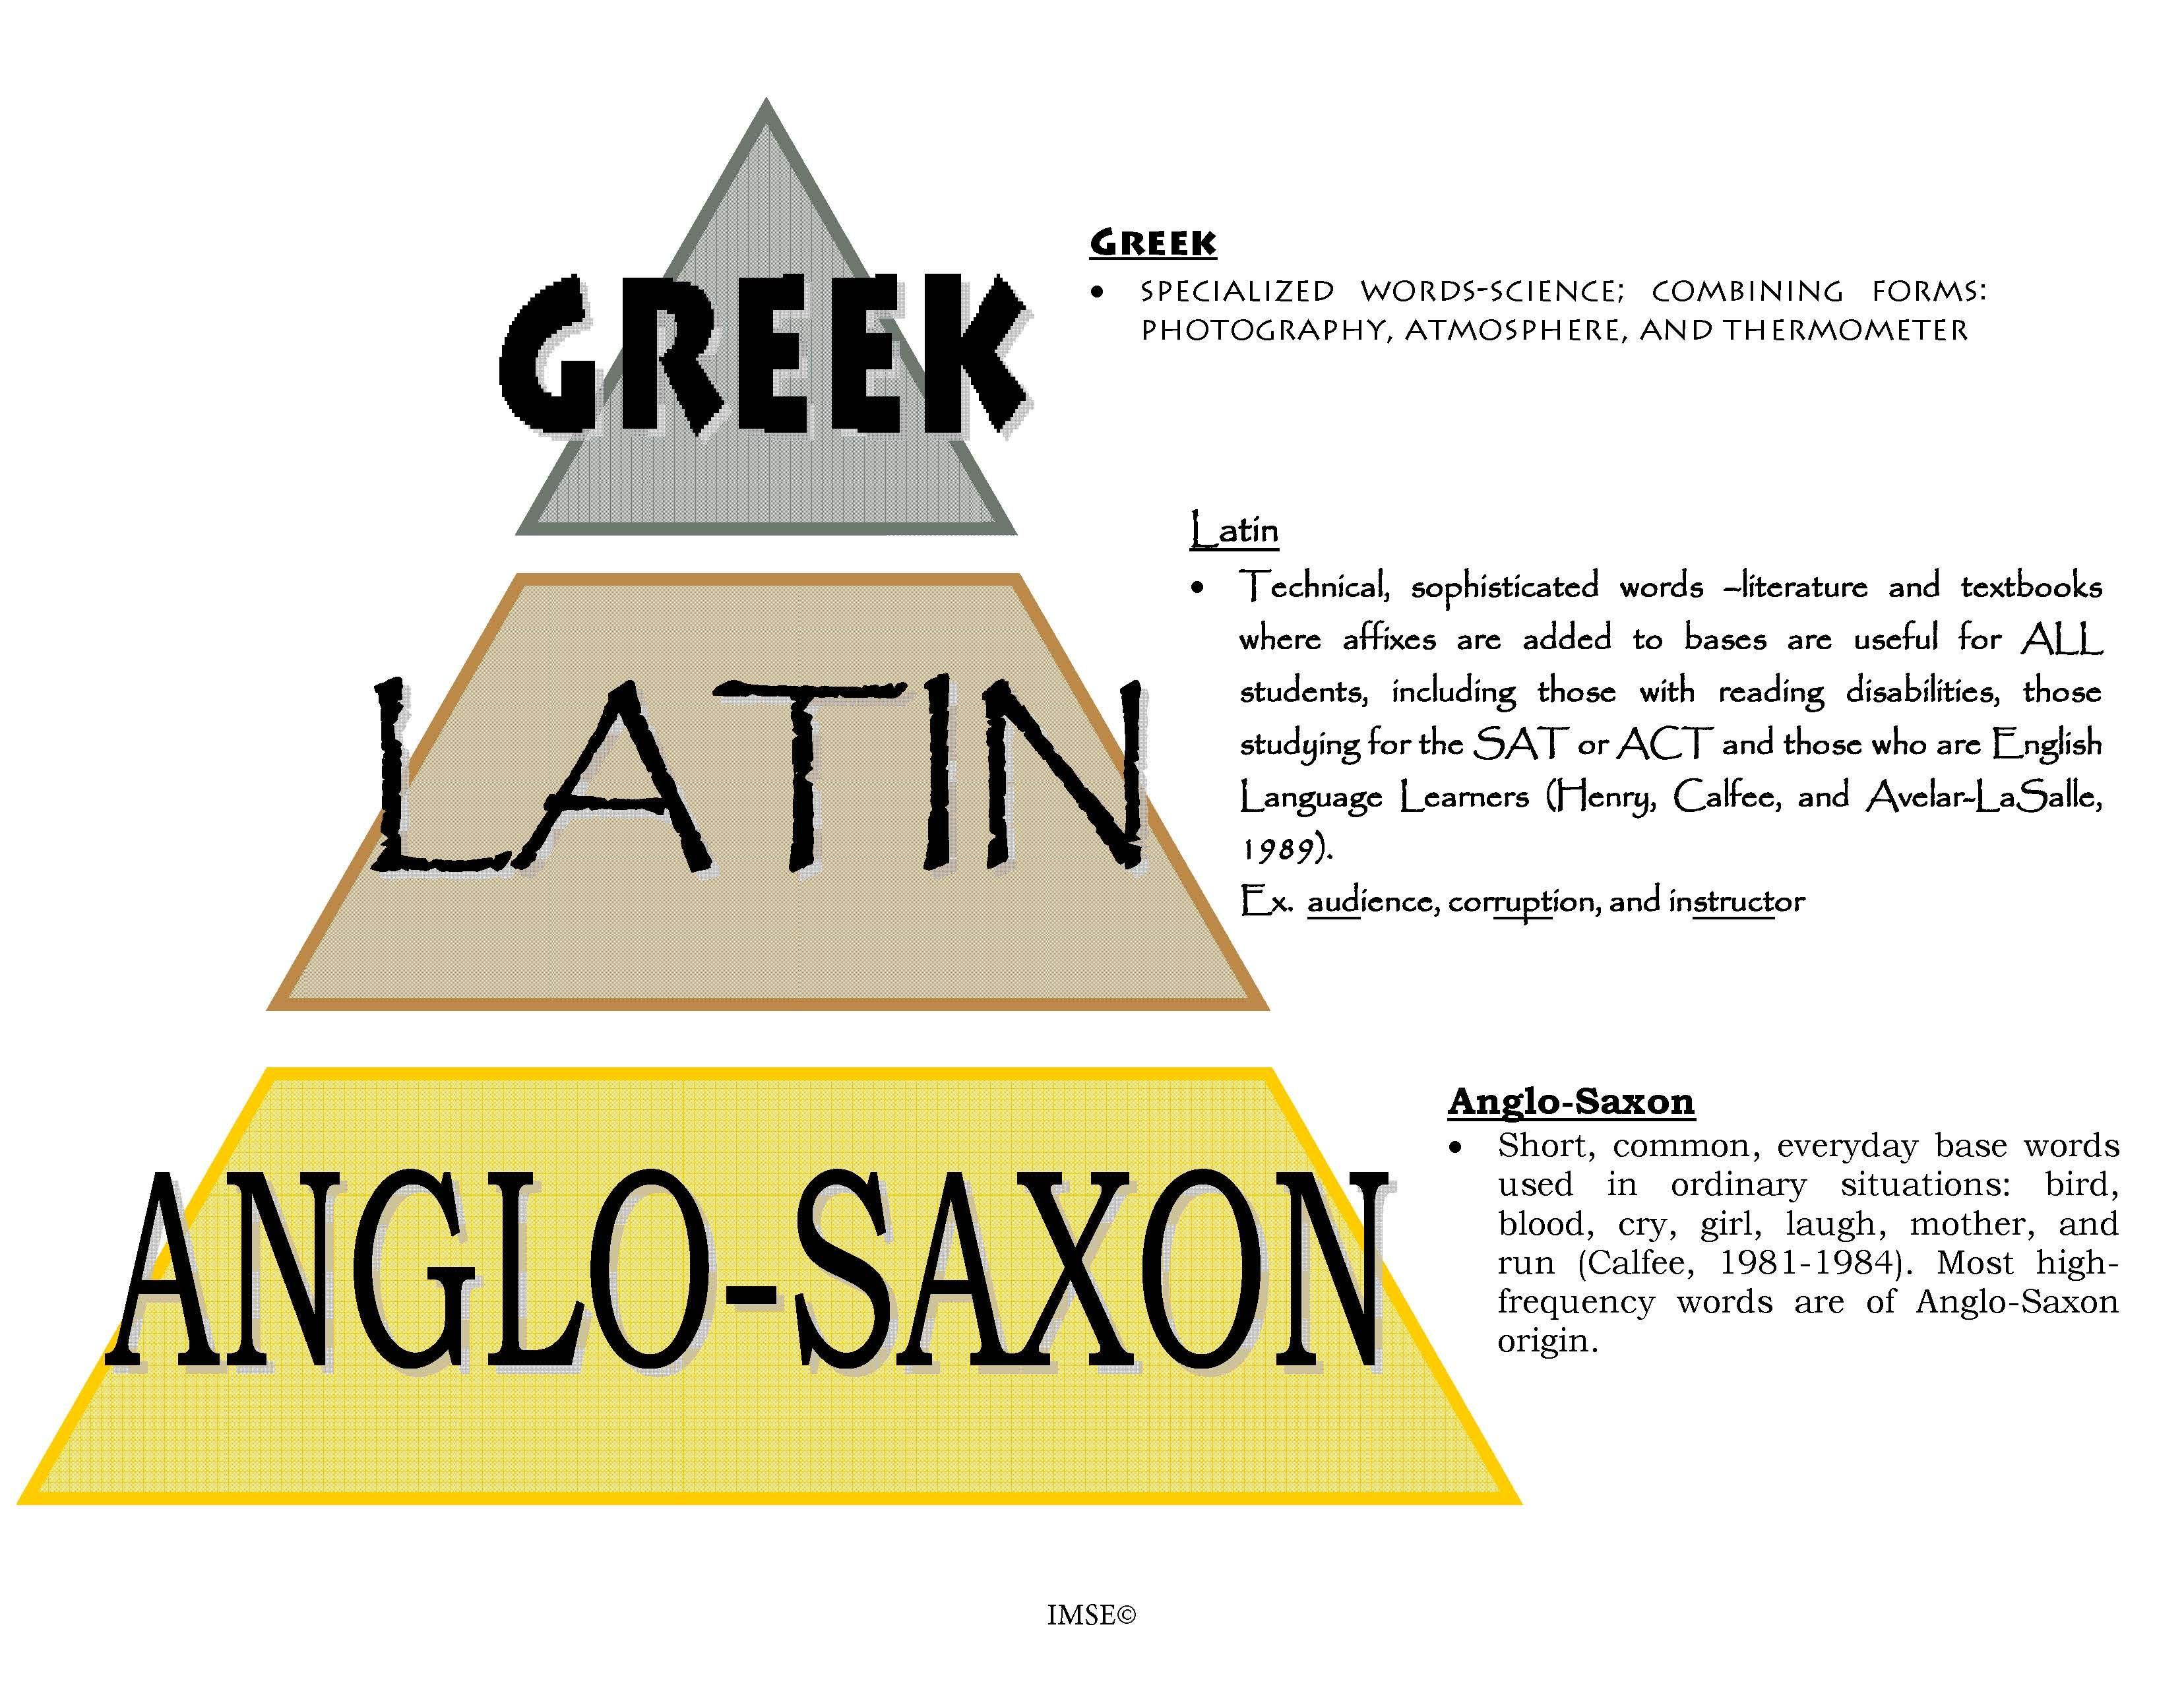 Pin About Latin Language On Imse Journal